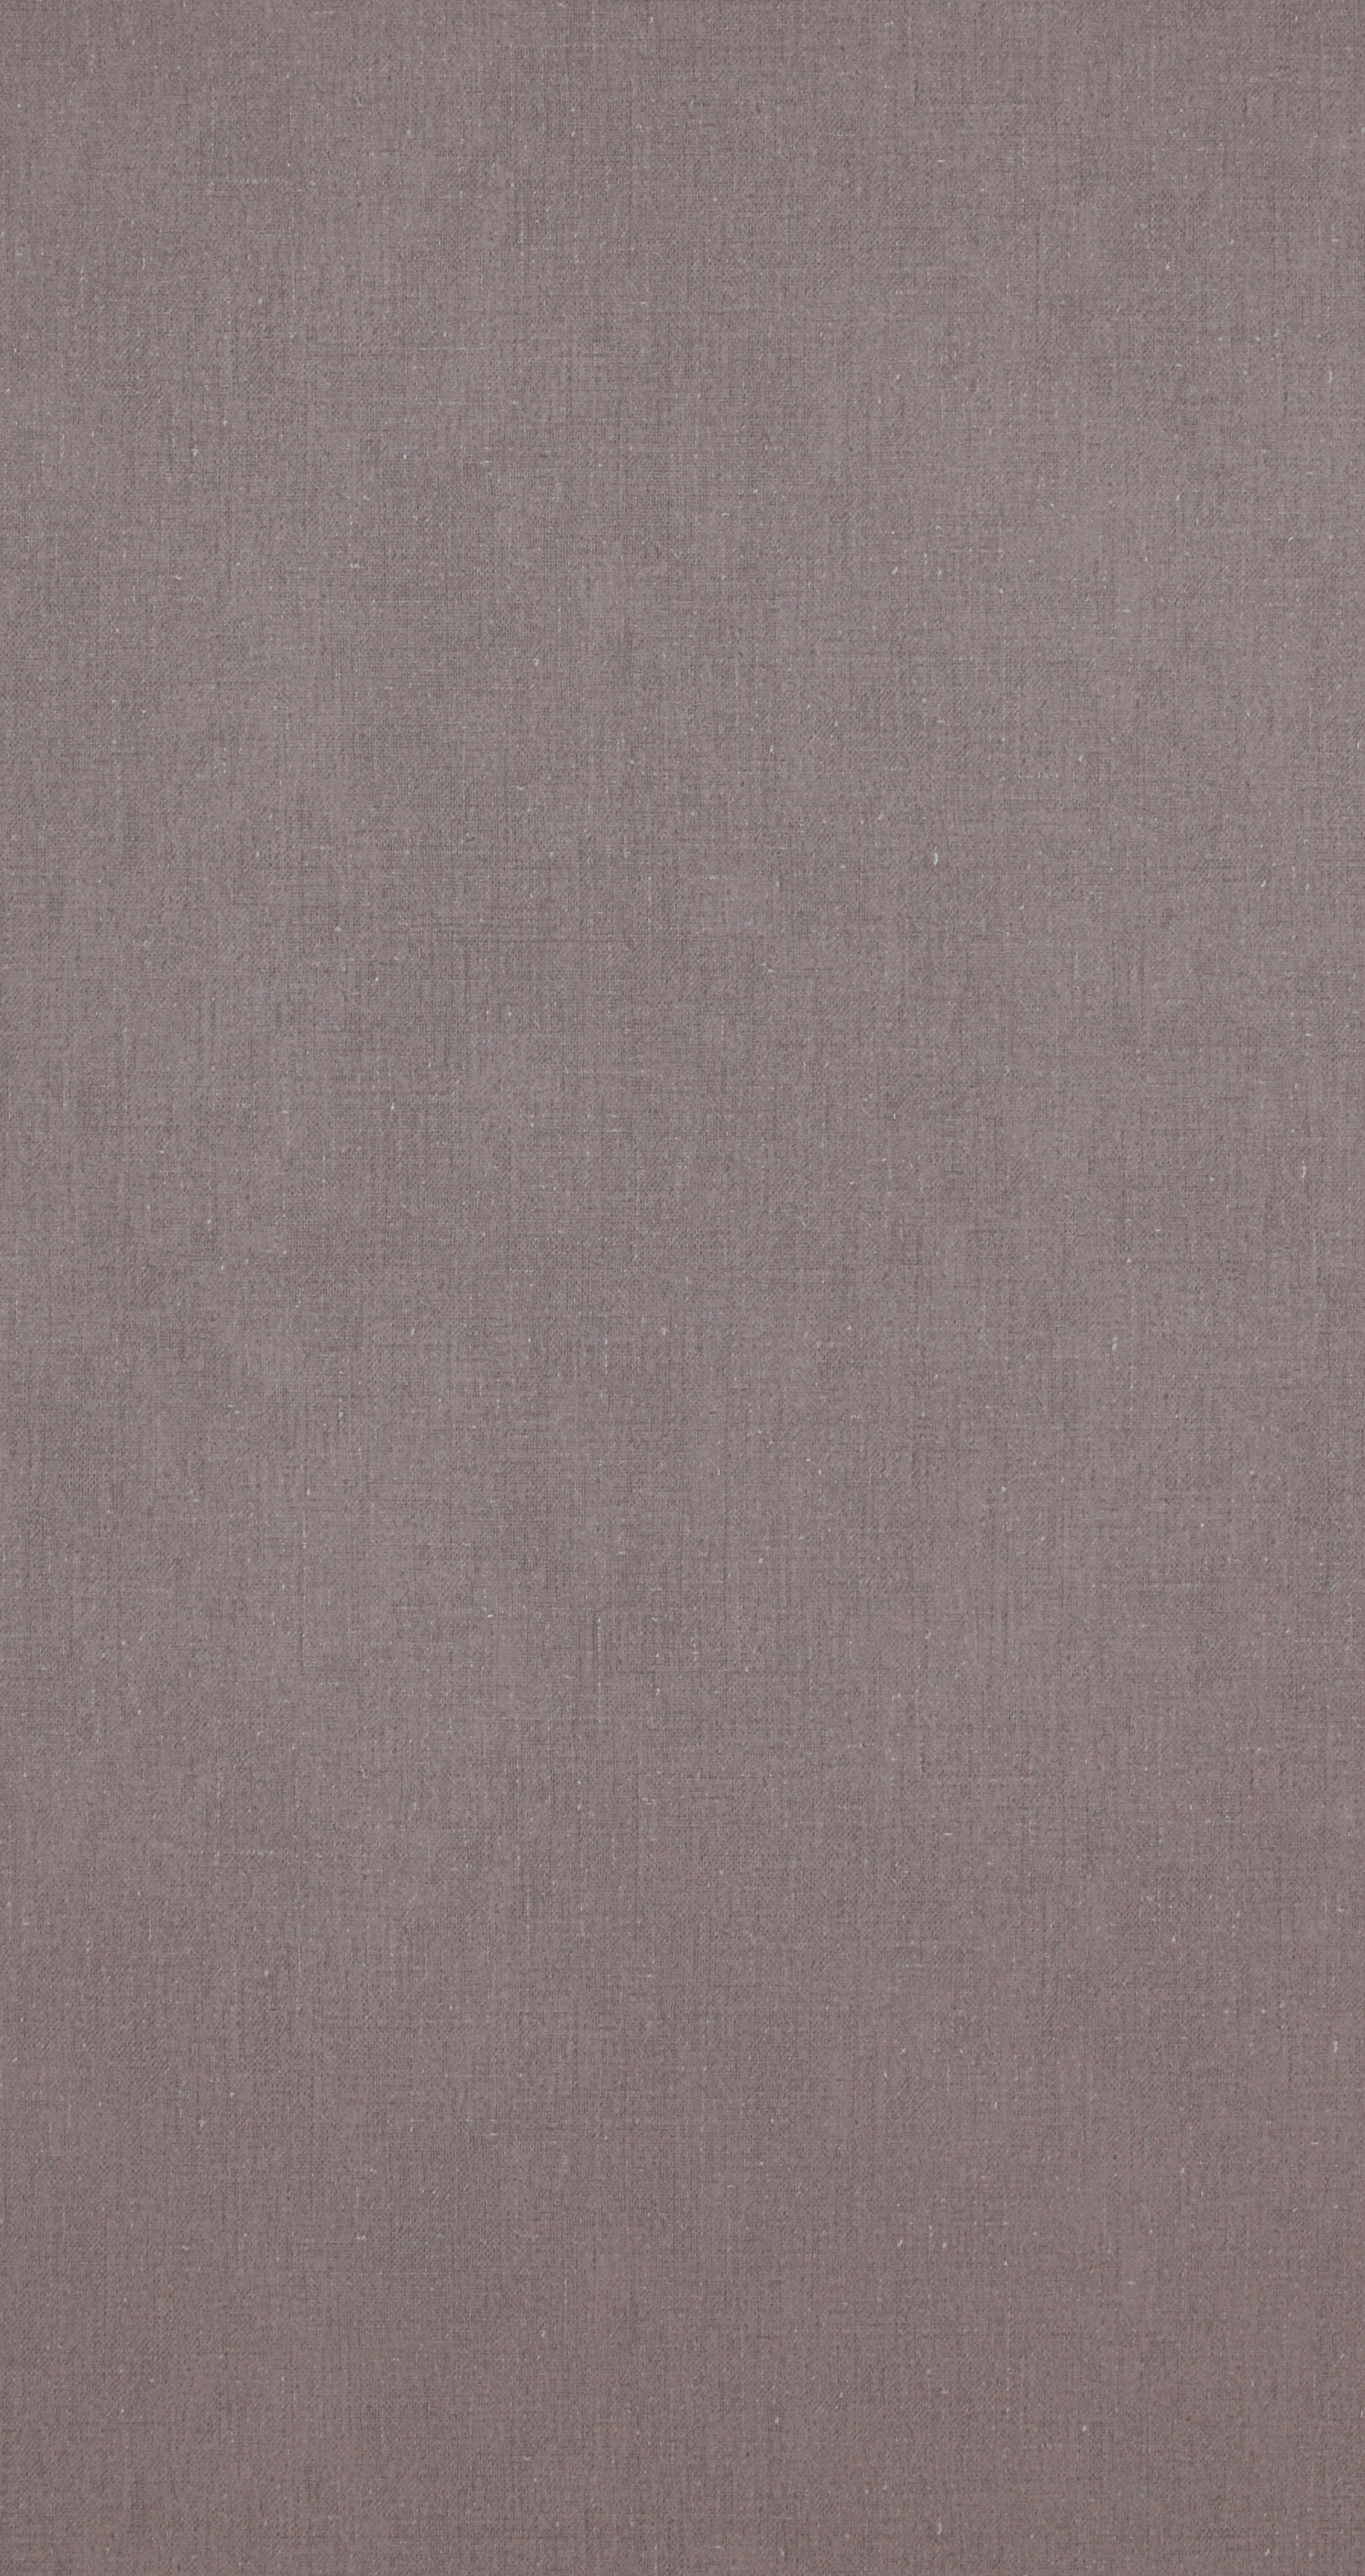 Обои  BN International,  коллекция Chacran II, артикул18406